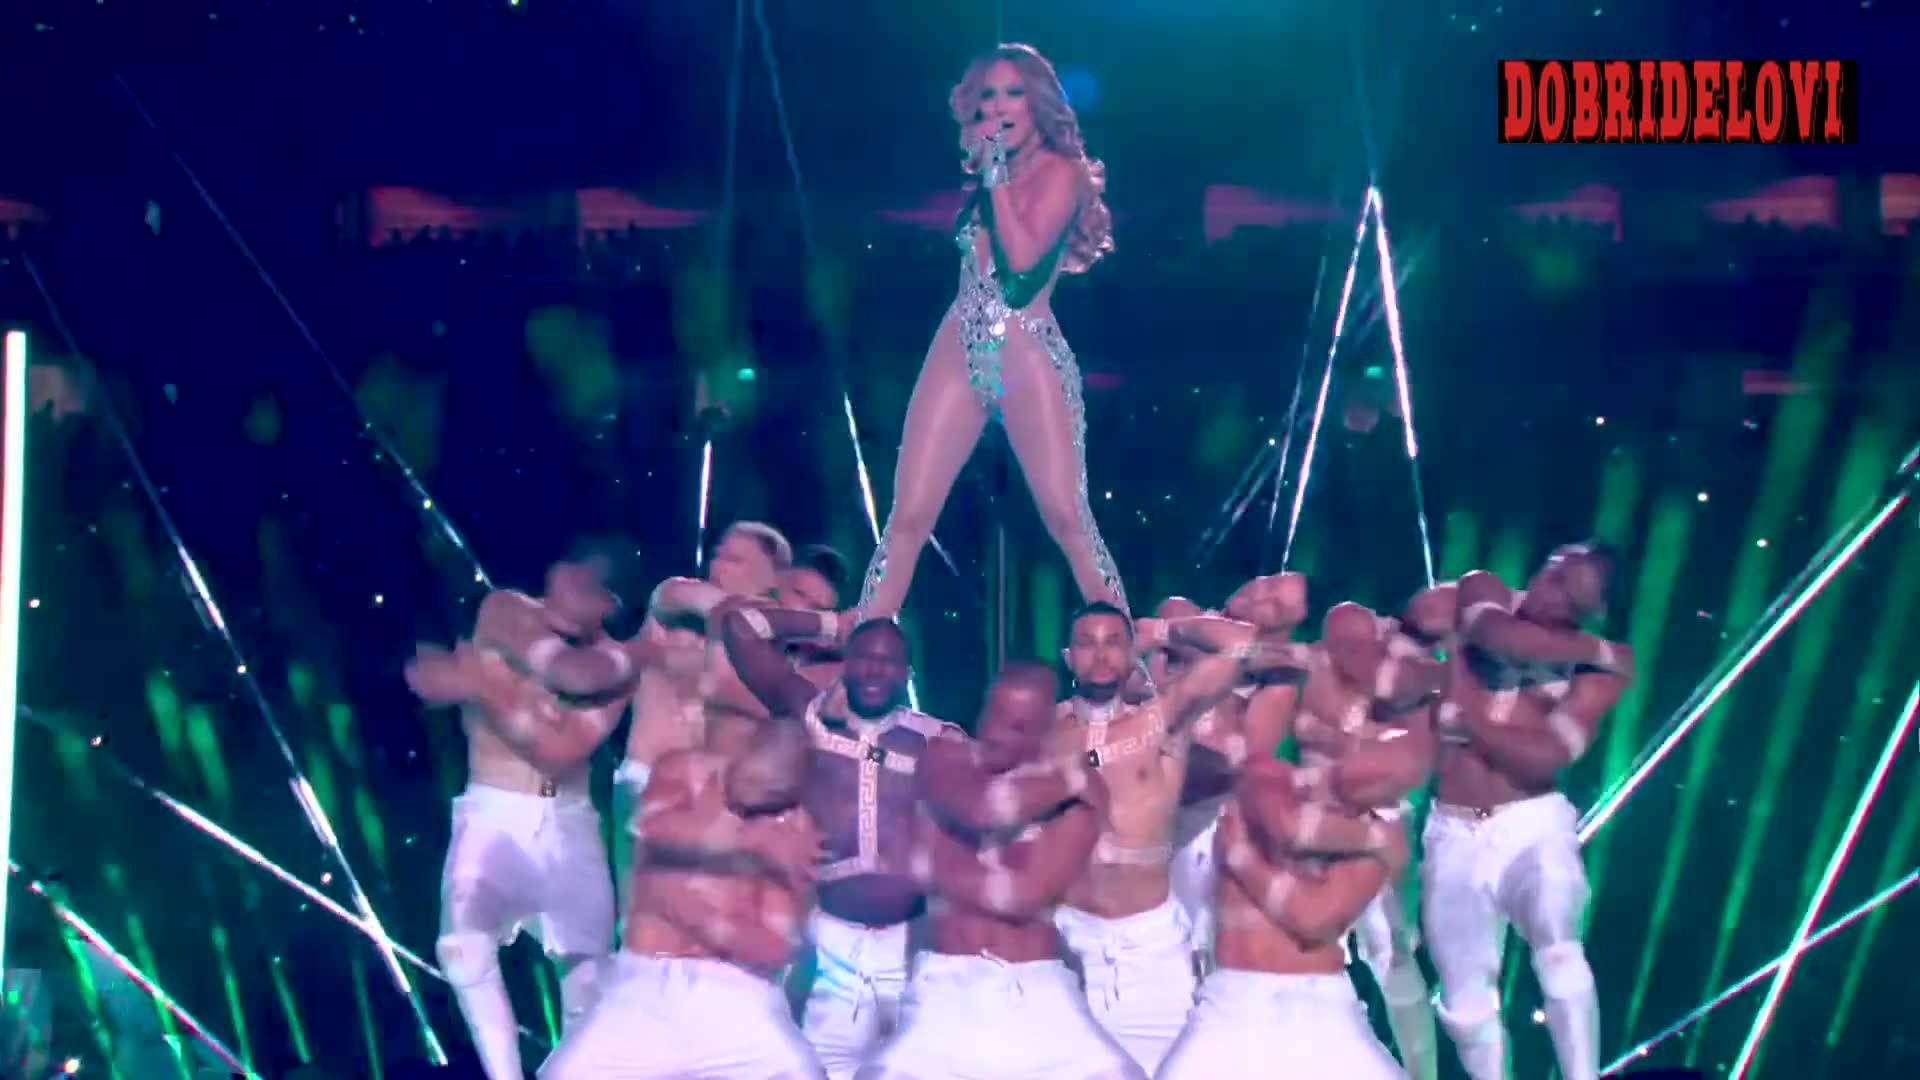 Jennifer Lopez performance for the Super Bowl